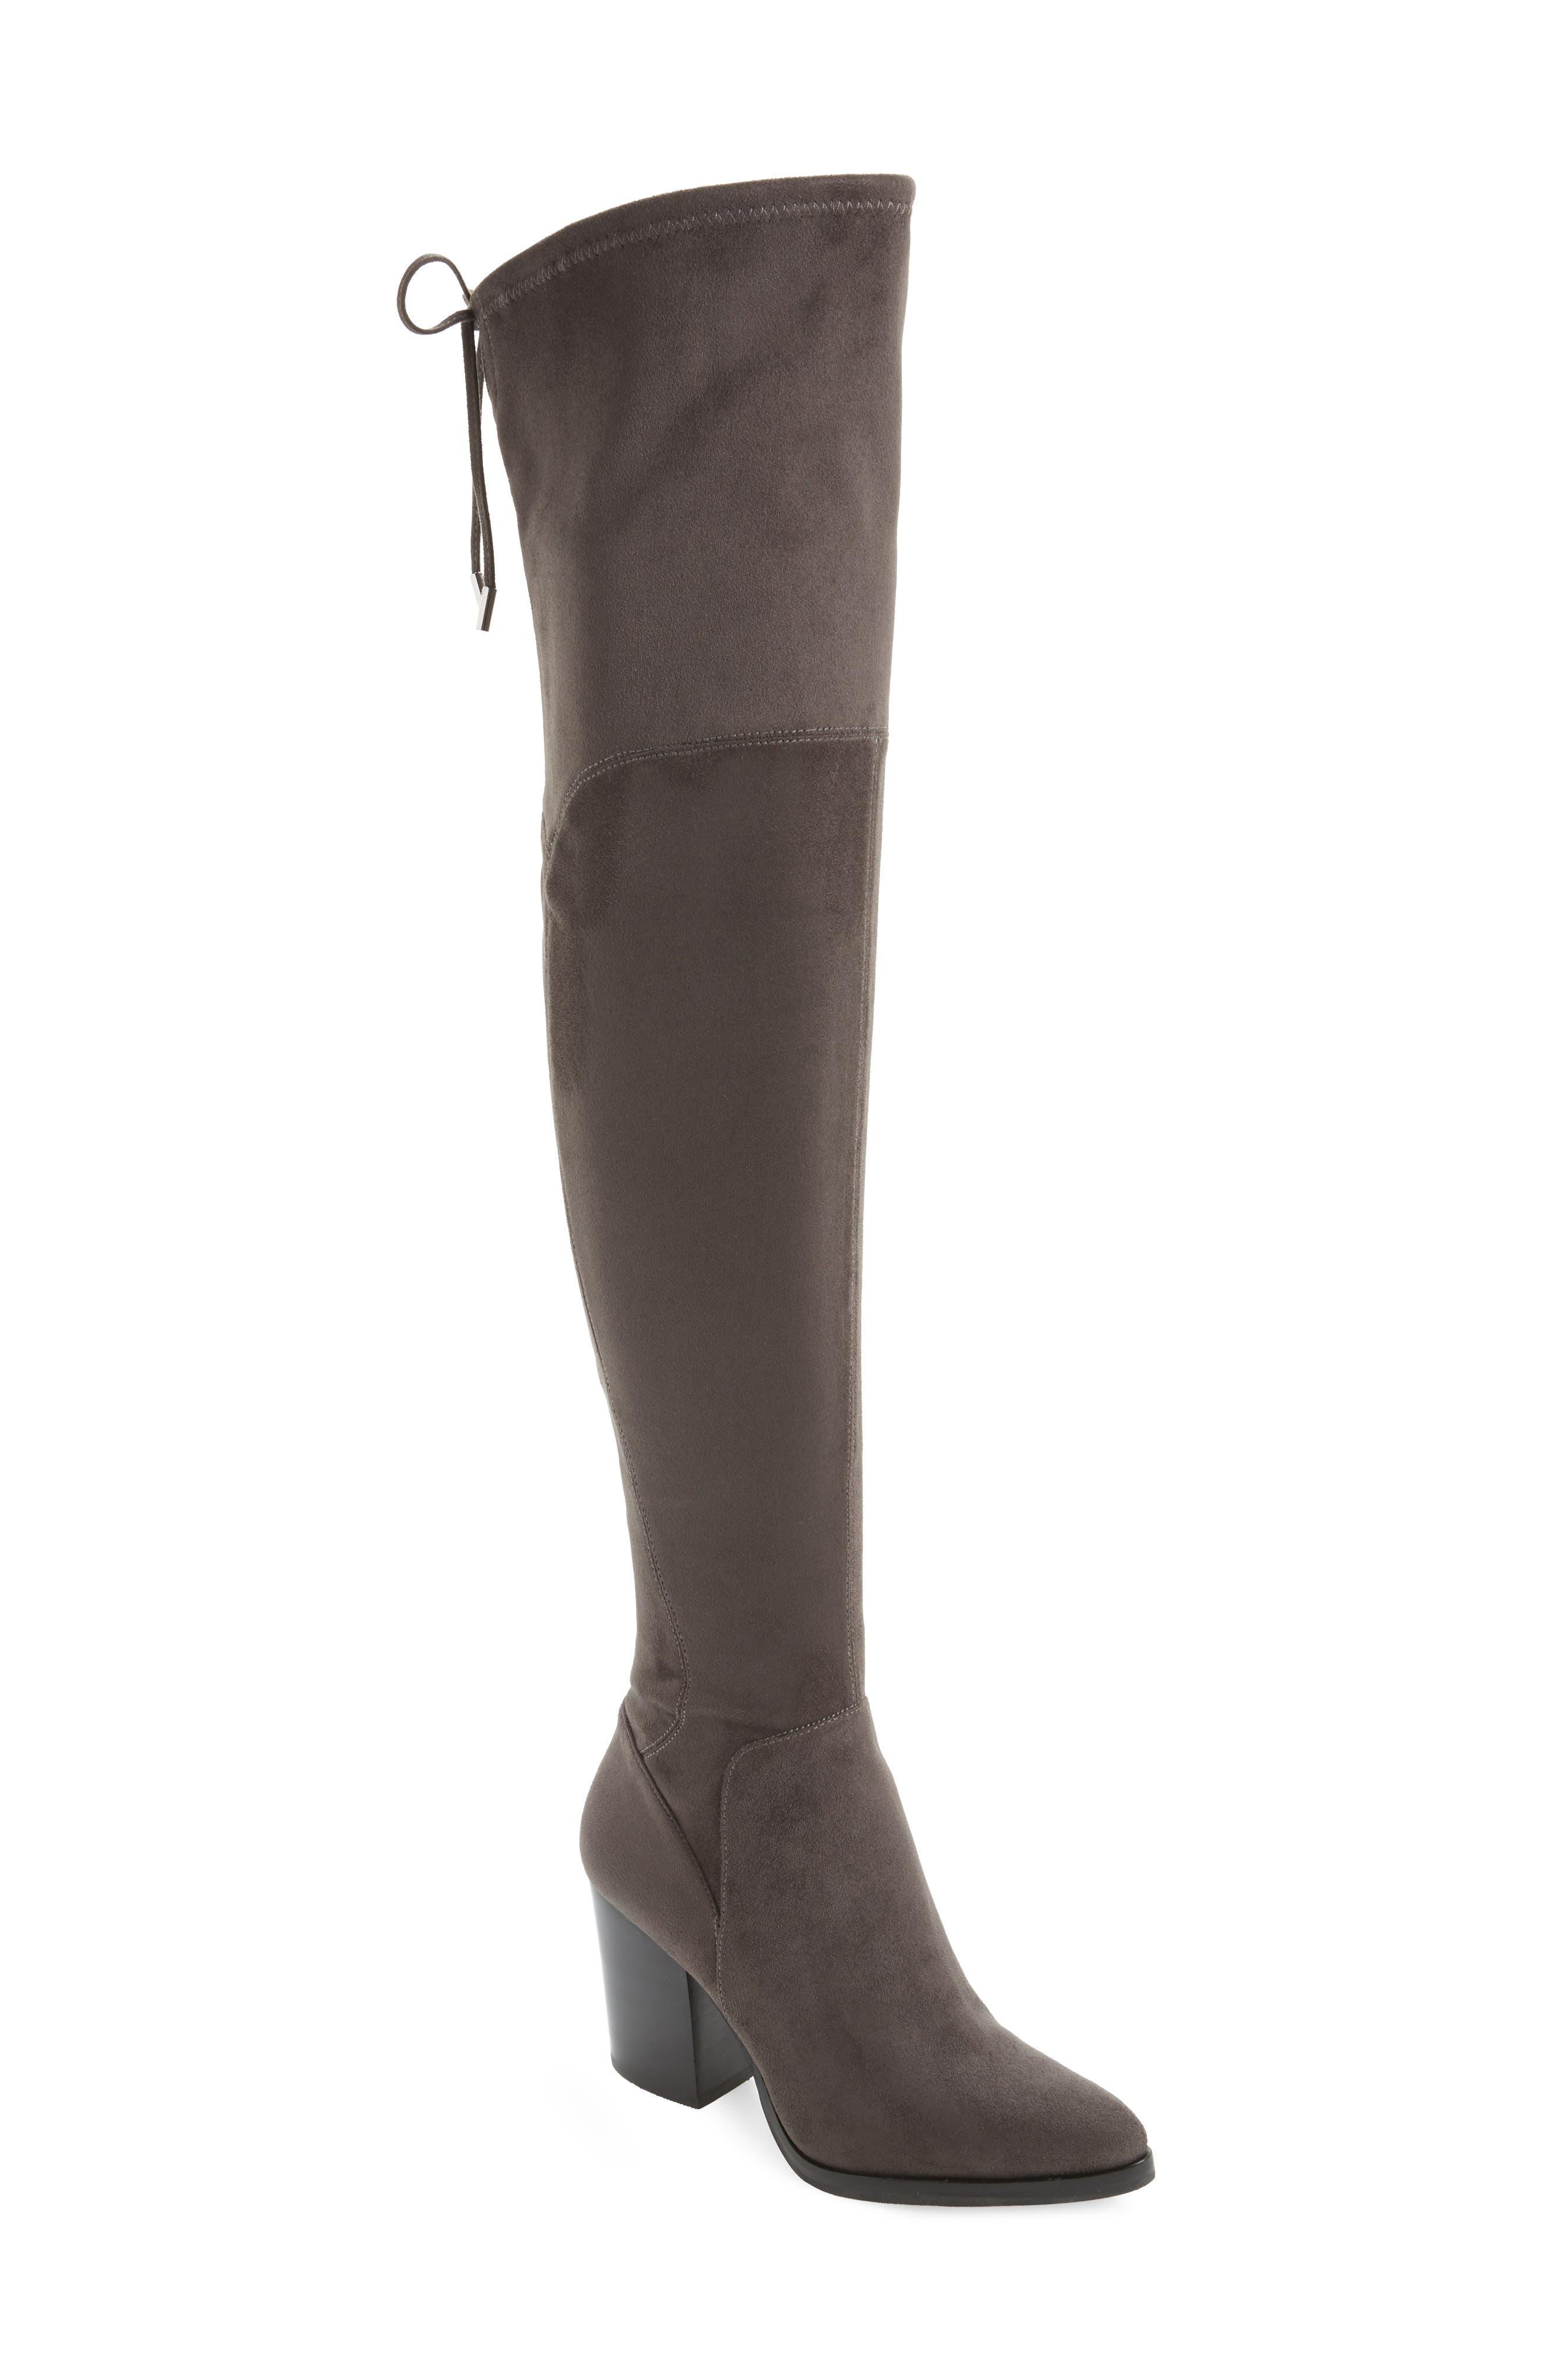 Alternate Image 1 Selected - Marc Fisher LTD Adora Over the Knee Boot (Women)